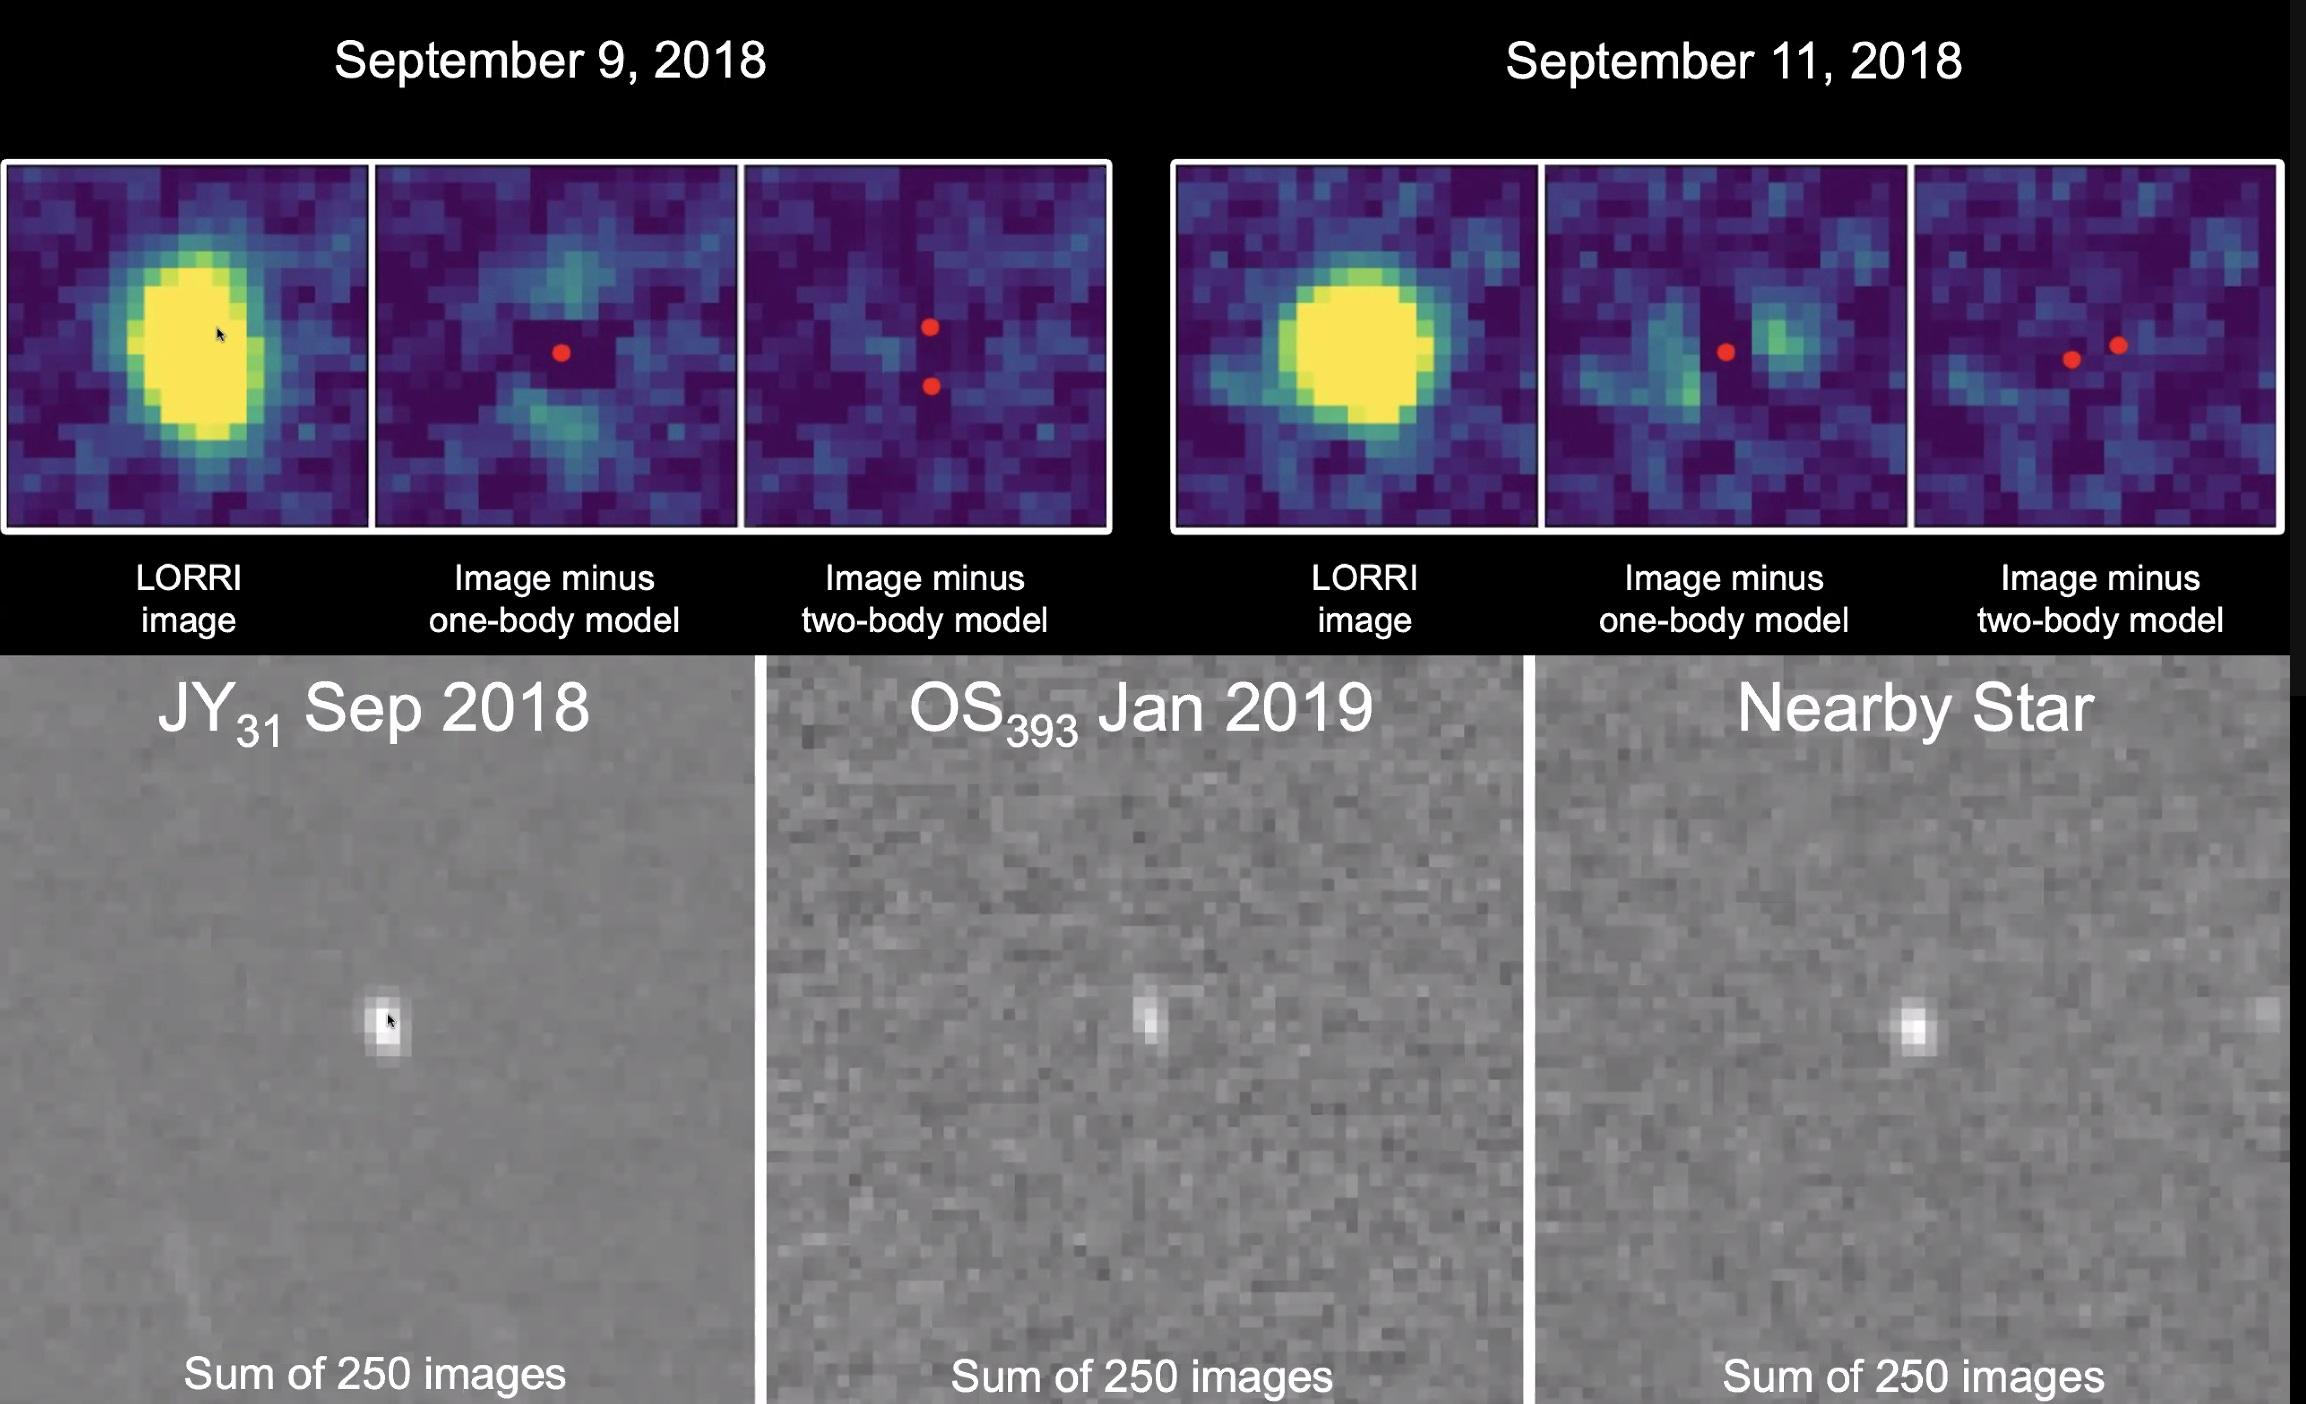 LORRI images of asteroid pairs